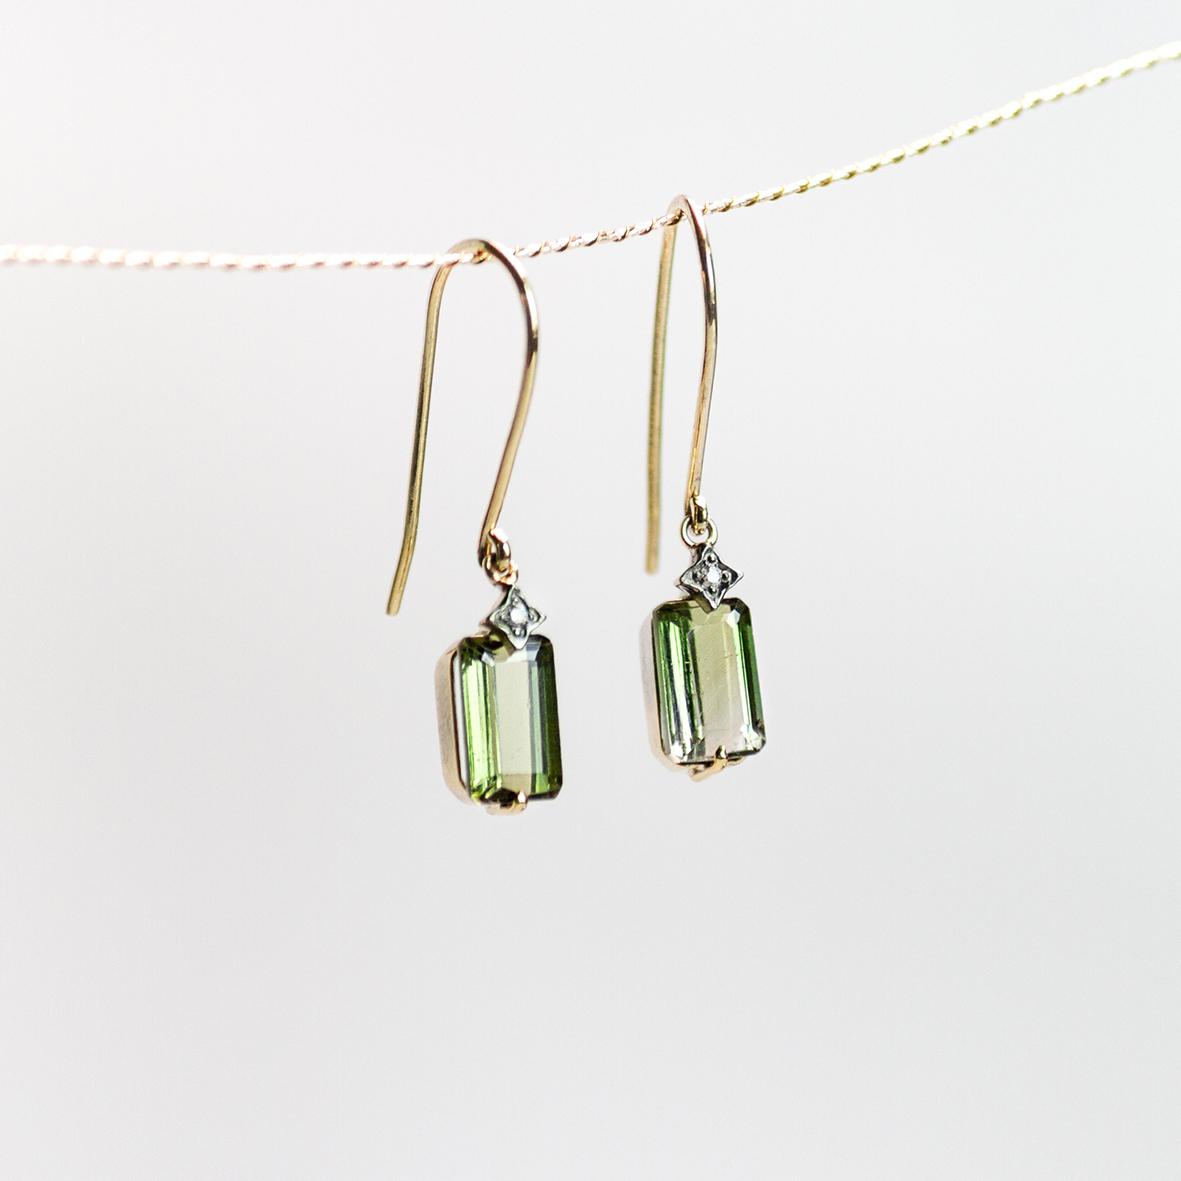 X. OONA_philo_ficha1_green tourmaline emerald earrings